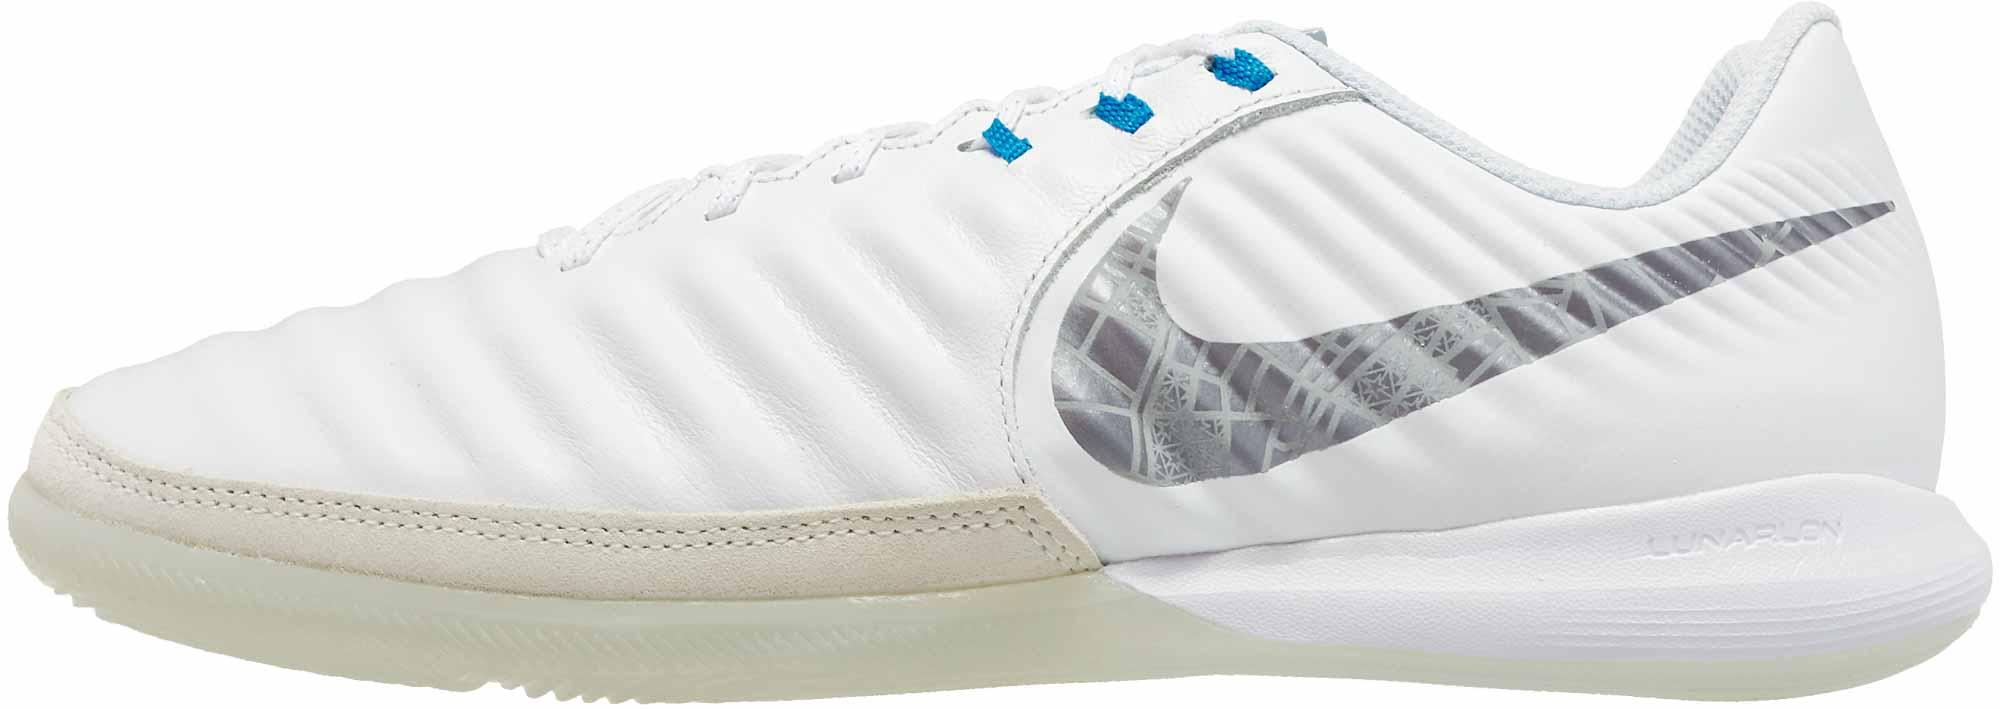 9ed332e9421a Nike Tiempo LegendX 7 Pro IC - White/Metallic Cool Grey/Blue Hero ...